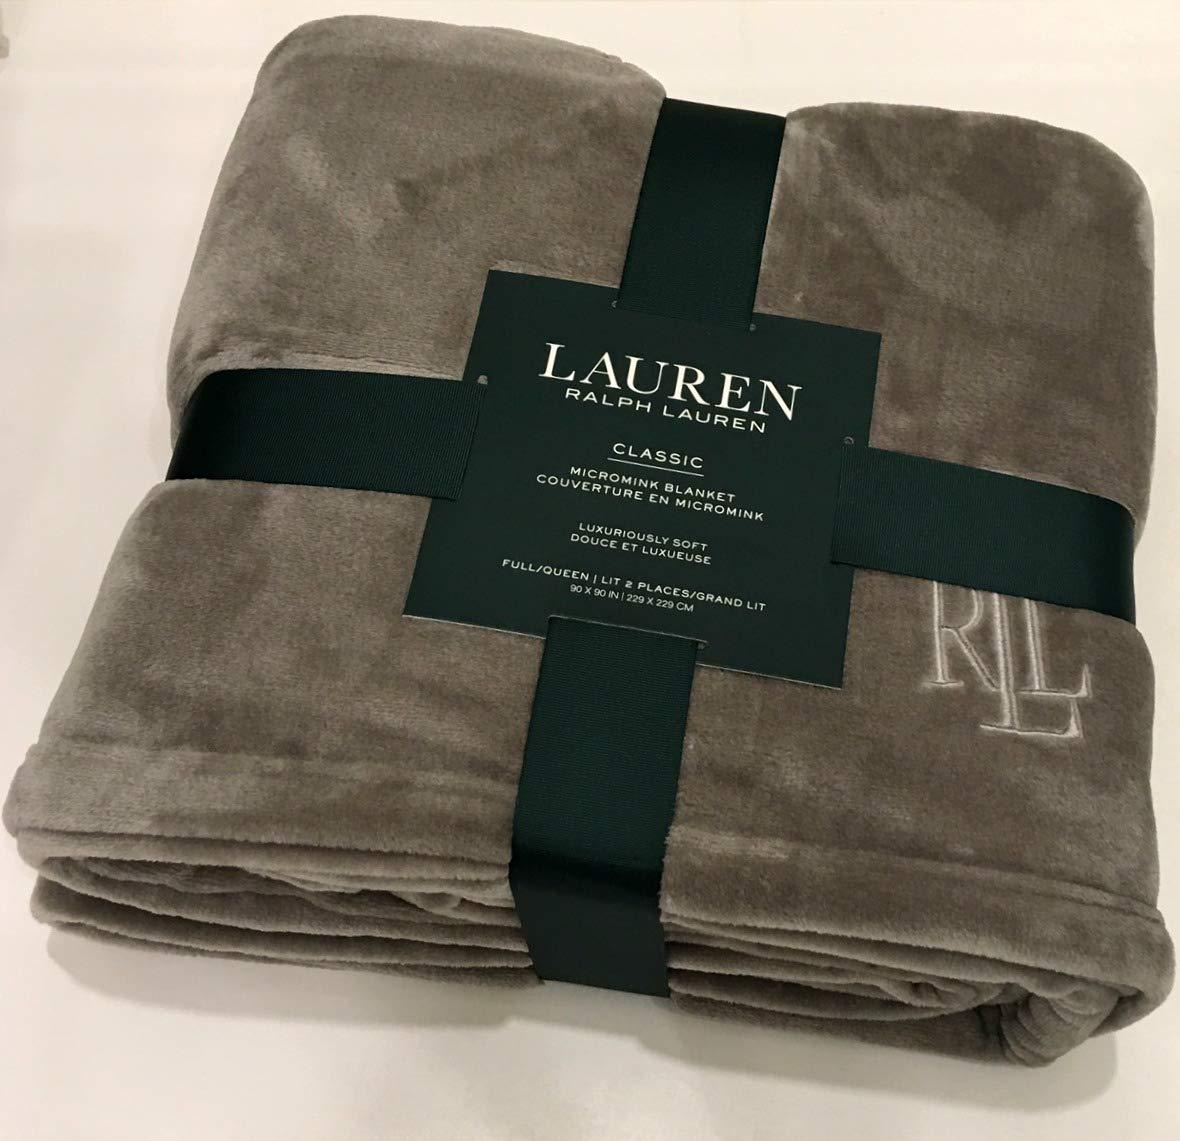 Ralph Lauren Classic Charcoal Gray Micromink Plush All Season Blanket   Full/Queen 90'' x 90''   Machine Wash, Tumble Dry